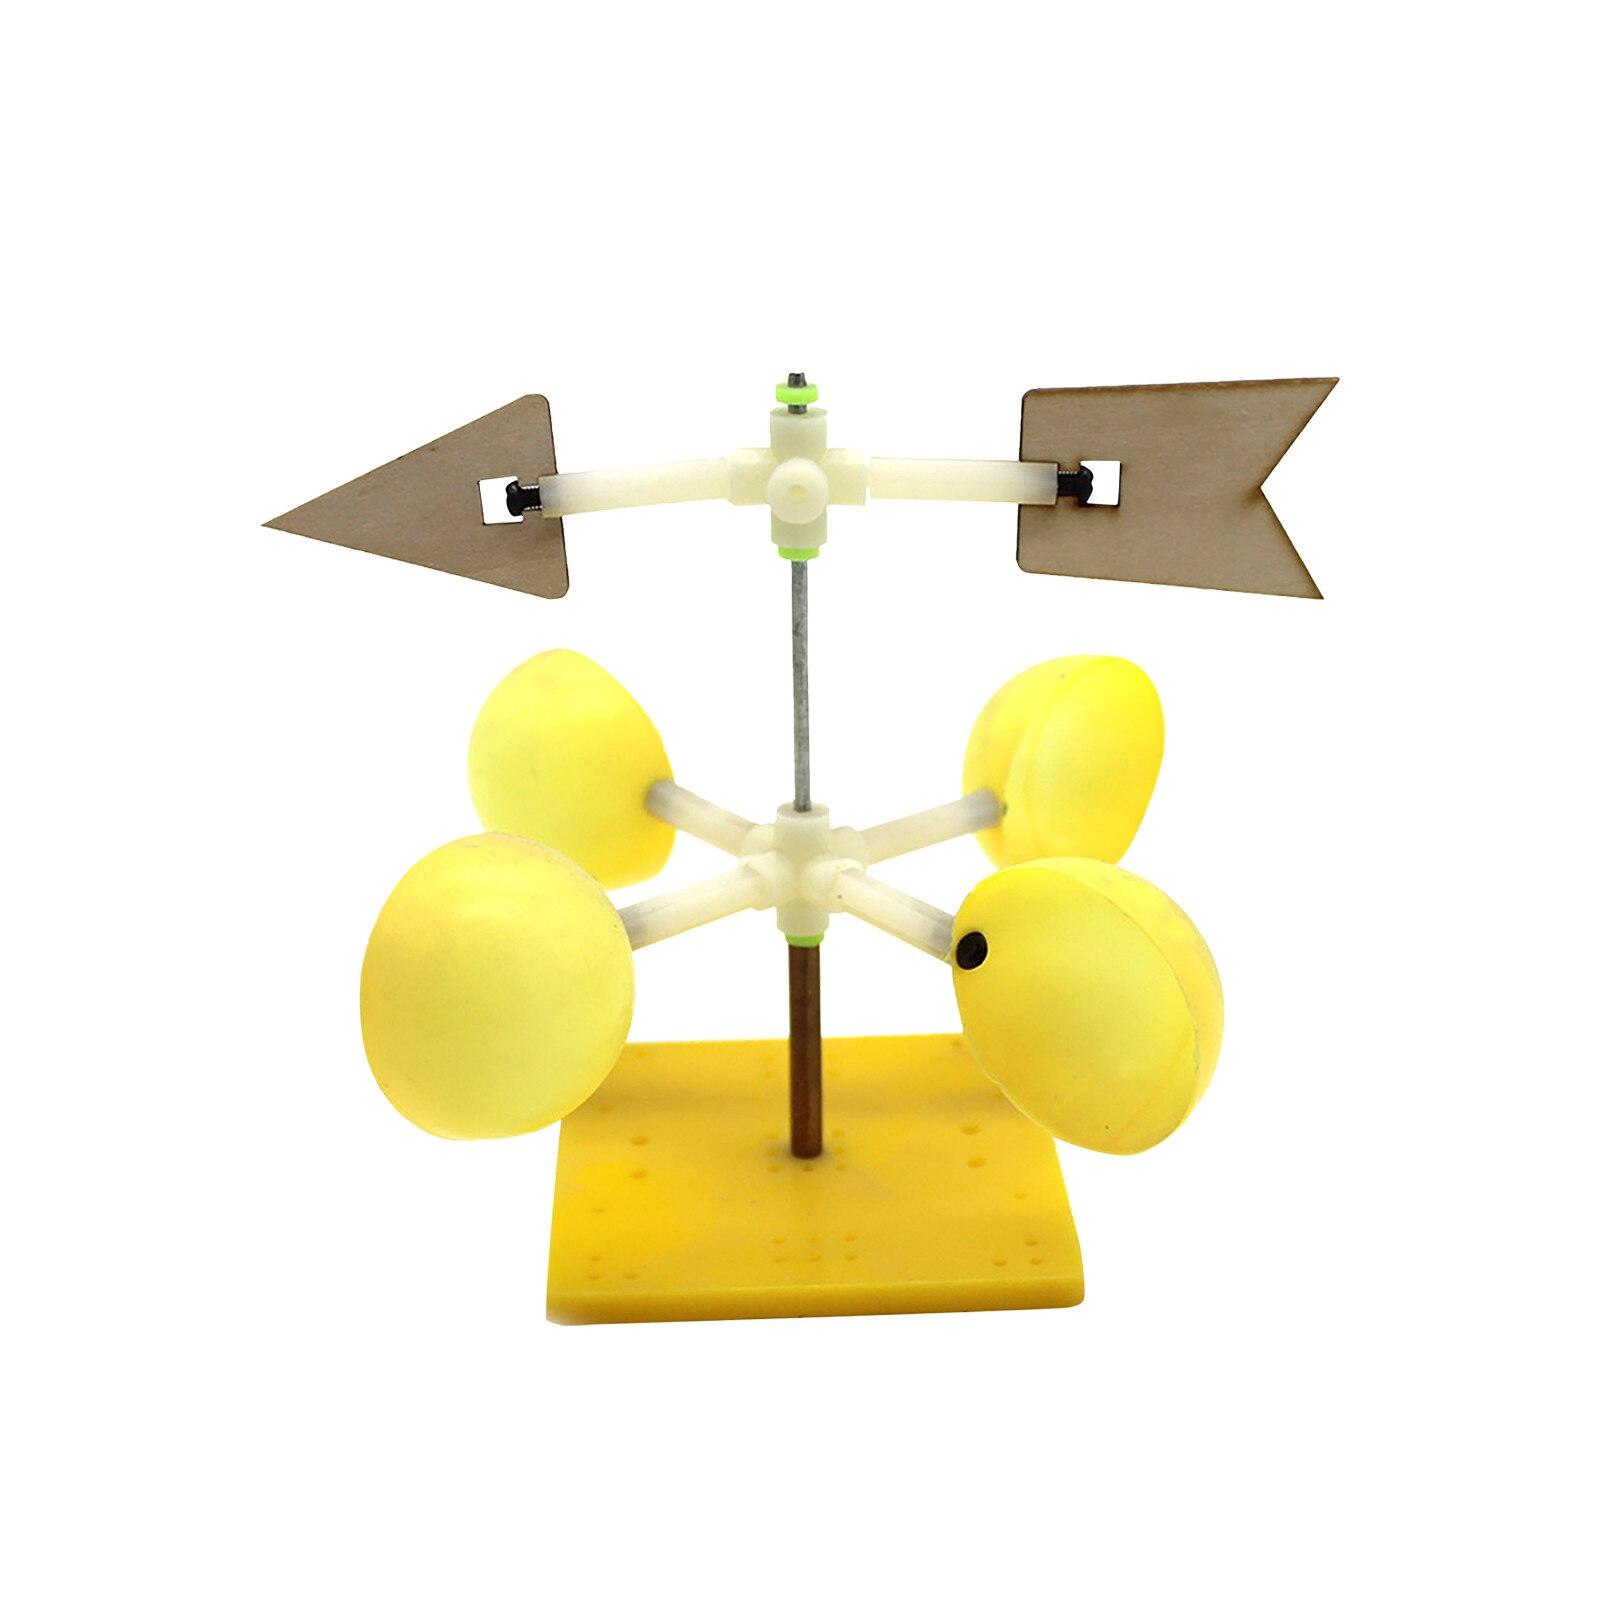 Kit de modelo de Veleta para niños, Kit de tecnología para manualidades, brújula de viento, Material de experimento científico, paleta de viento